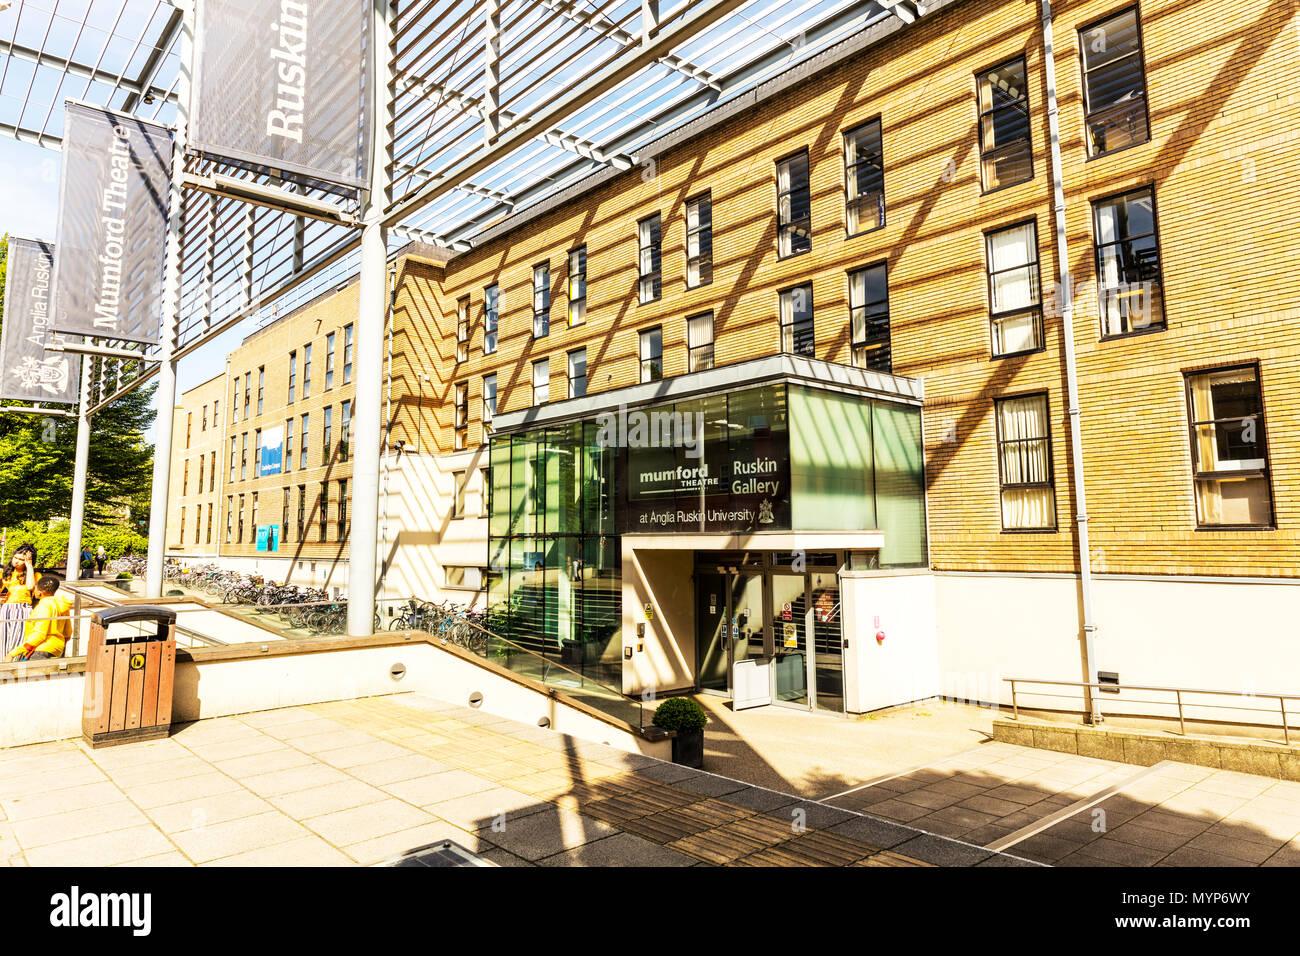 Mumford Theatre Cambridge, Anglia Ruskin University, East Rd, Cambridge, university theatre, Mumford Theatre, Cambridge, theatres, UK, building, front Stock Photo